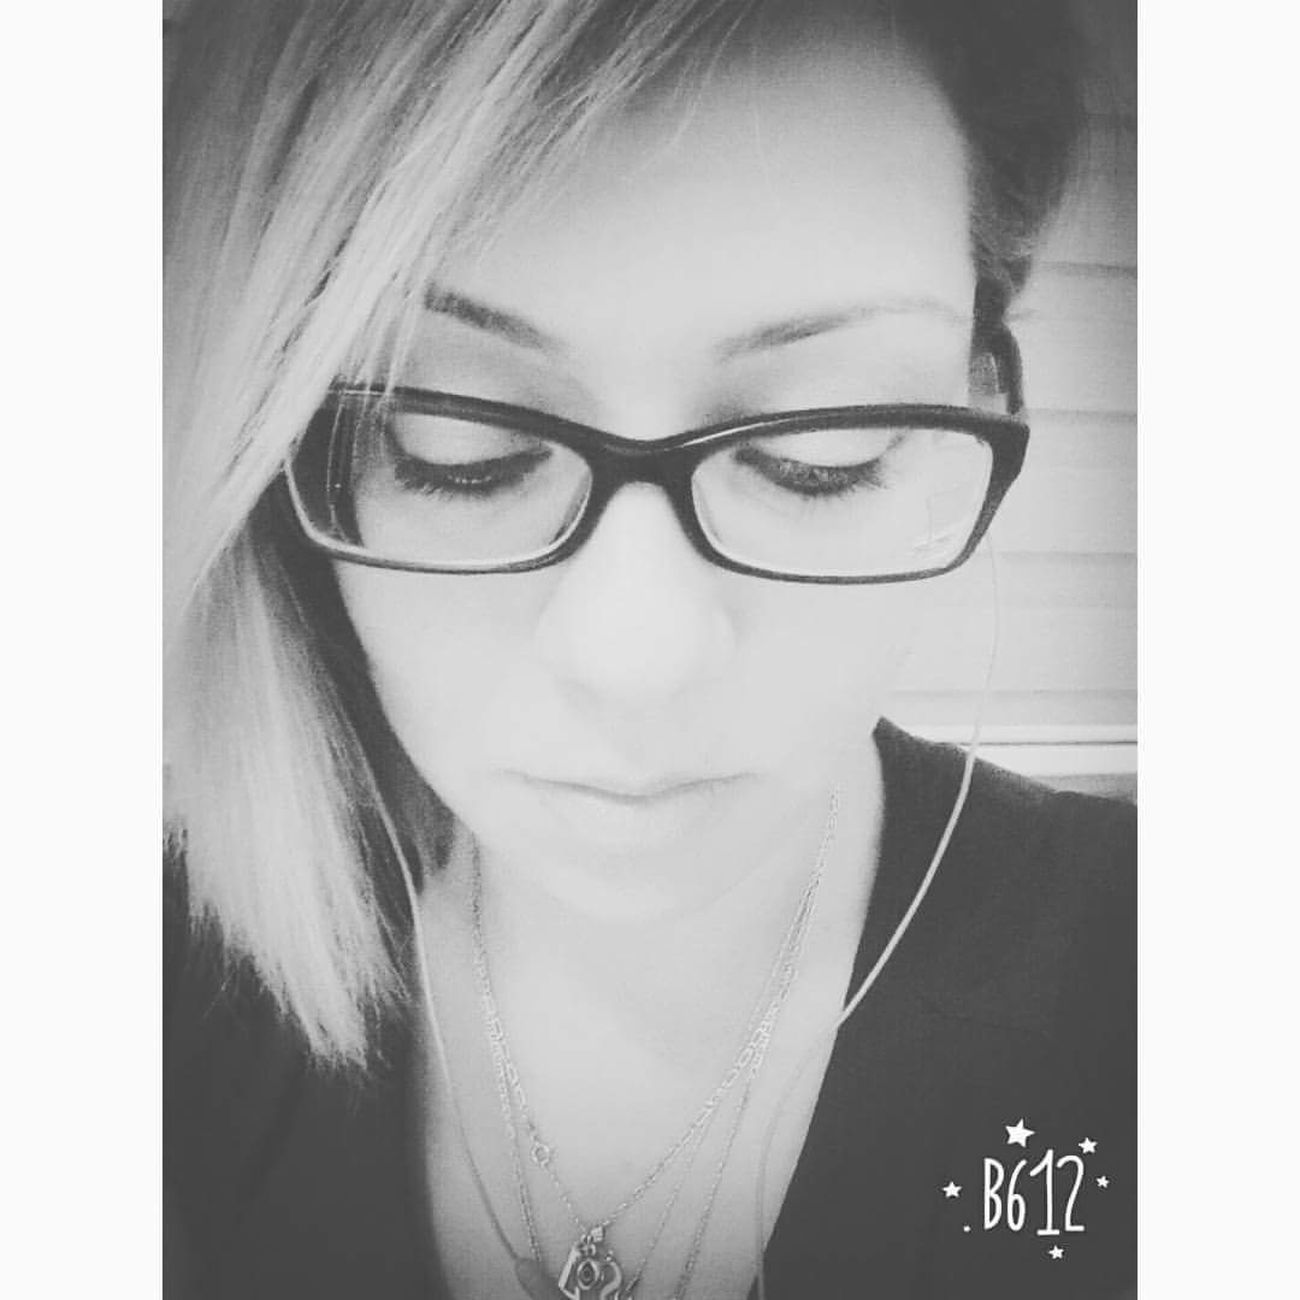 Sometimes... Funnygirl Hi! Smile Iyiyim Lifestyles Portrait Of A Woman Enjoying Life Gulumse Keyifleryerinde Geridondum Illbeok Myfight Turnback Cheese! Smile ✌ Uglygirl  Hello World EyeEm EyeEm Gallery Bnw Blackandwhite Portrait Blackandwhite Photography Bnw_collection